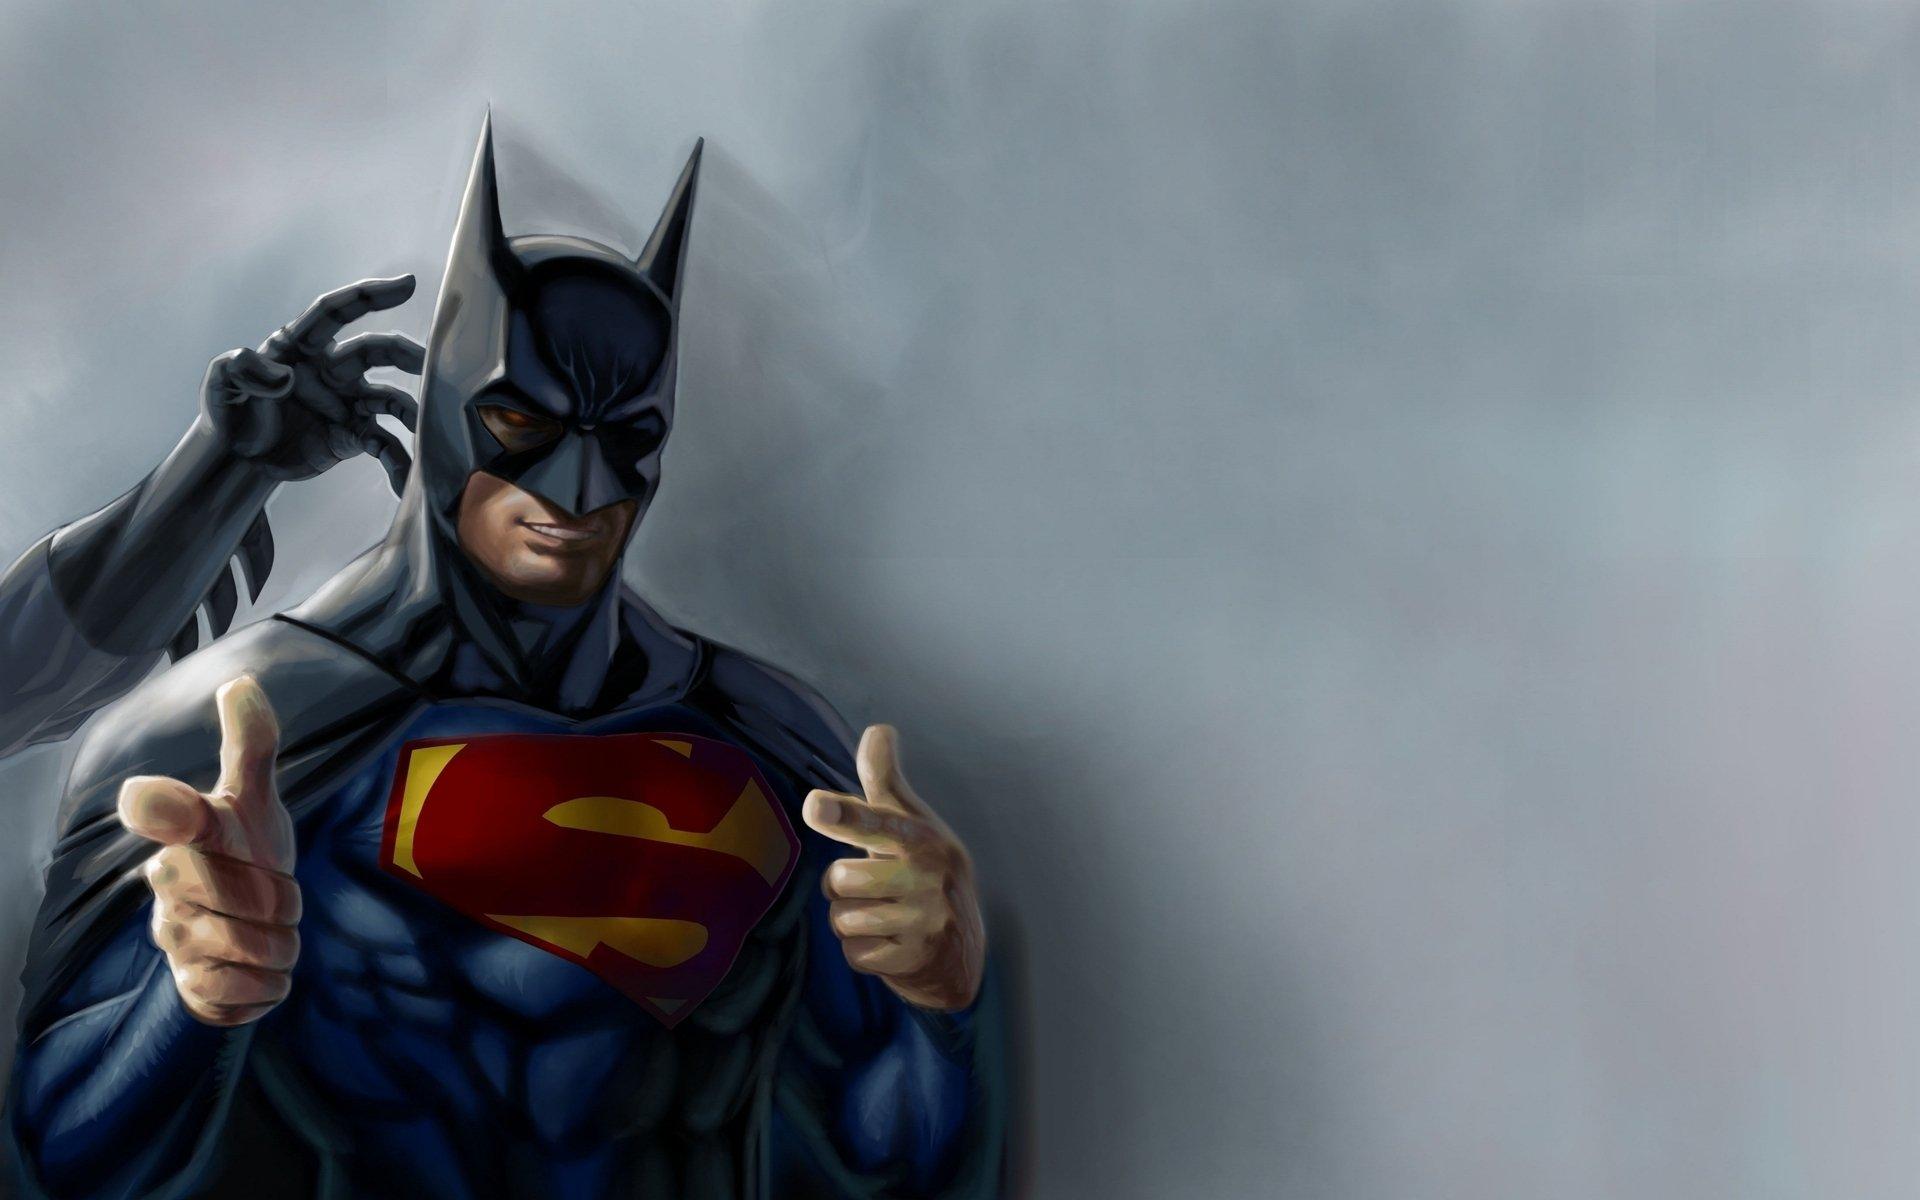 batman vs. superman full hd wallpaper and background image